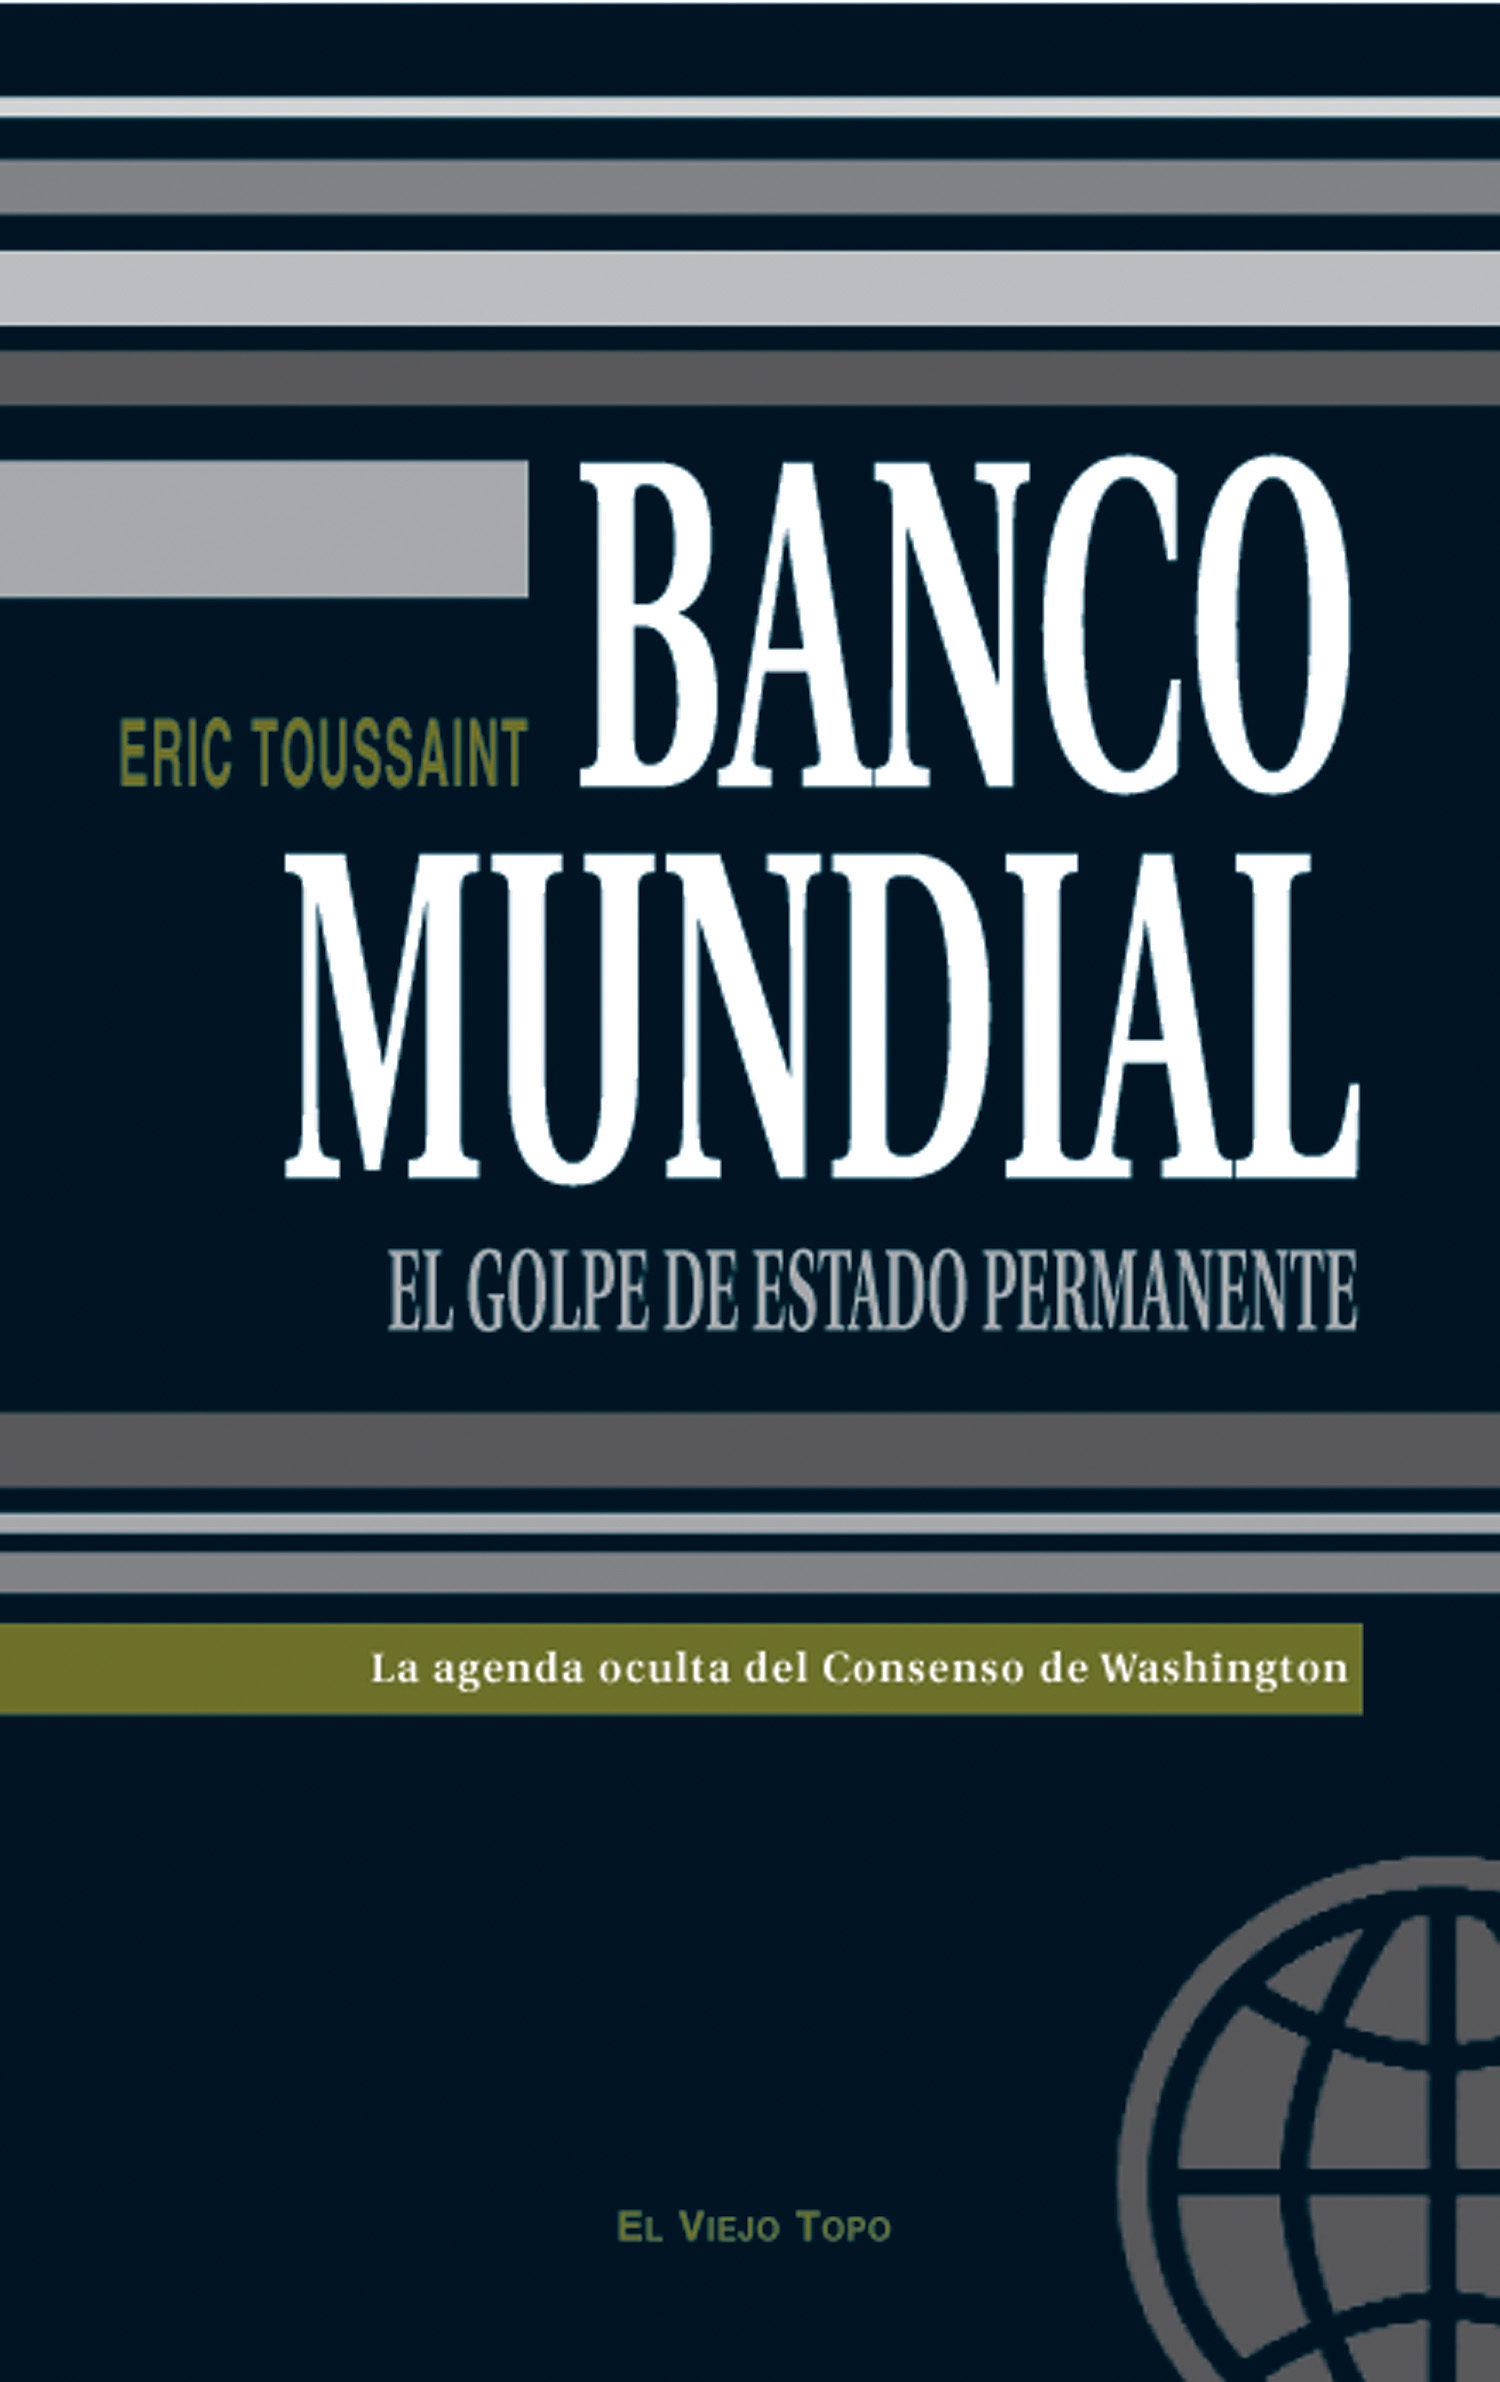 Banco Mundial: La Agenda Oculta Del Consenso De Washington (el Vi Ejo Topo) por Eric Toussaint